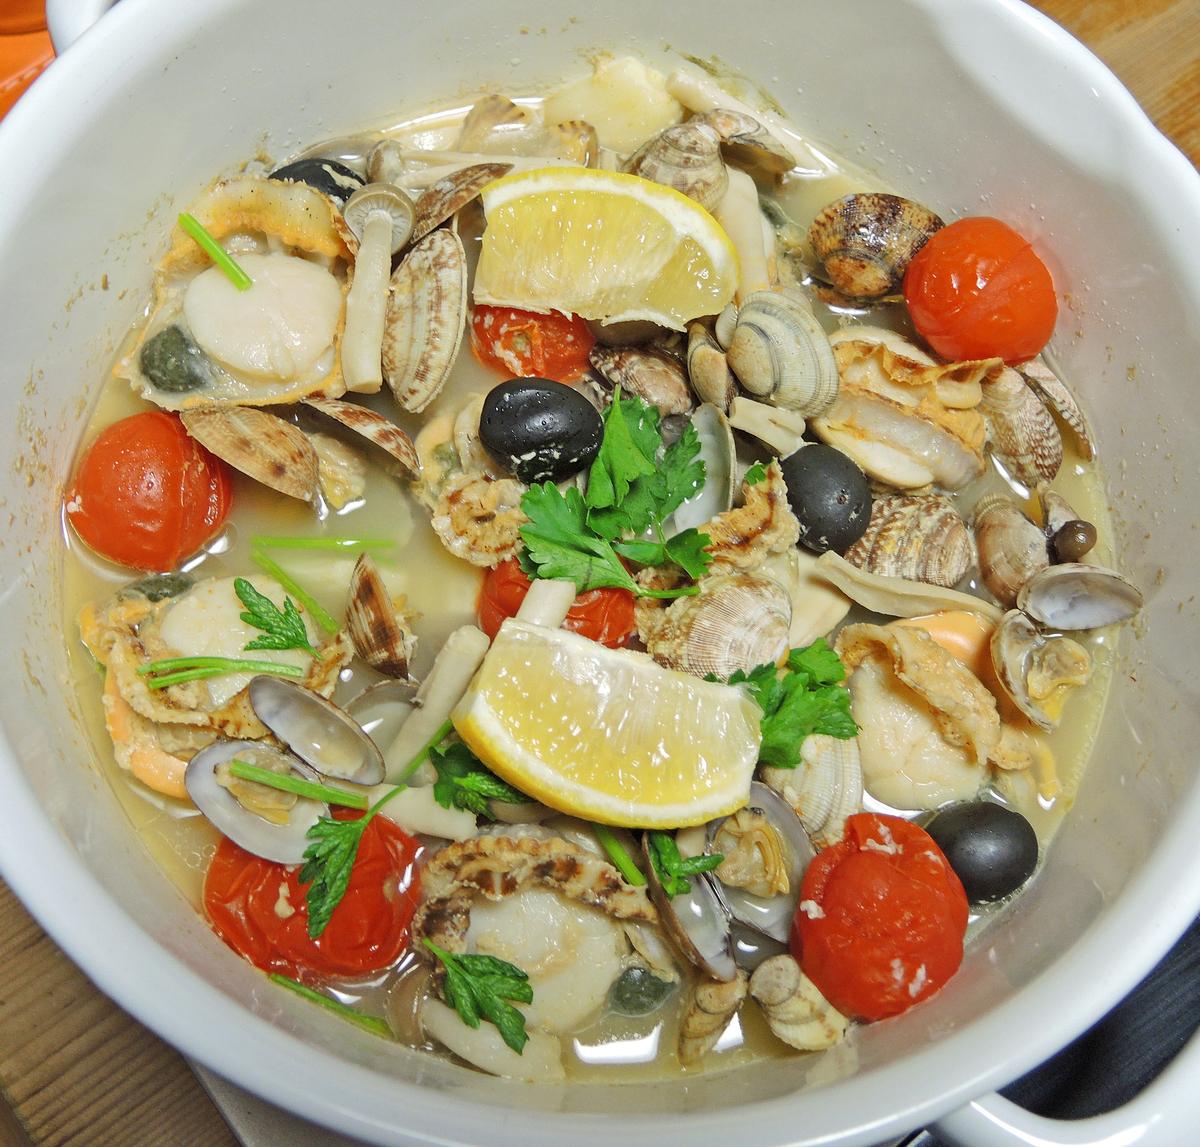 f:id:sashimi-fish1:20210119100454j:image:w170:left